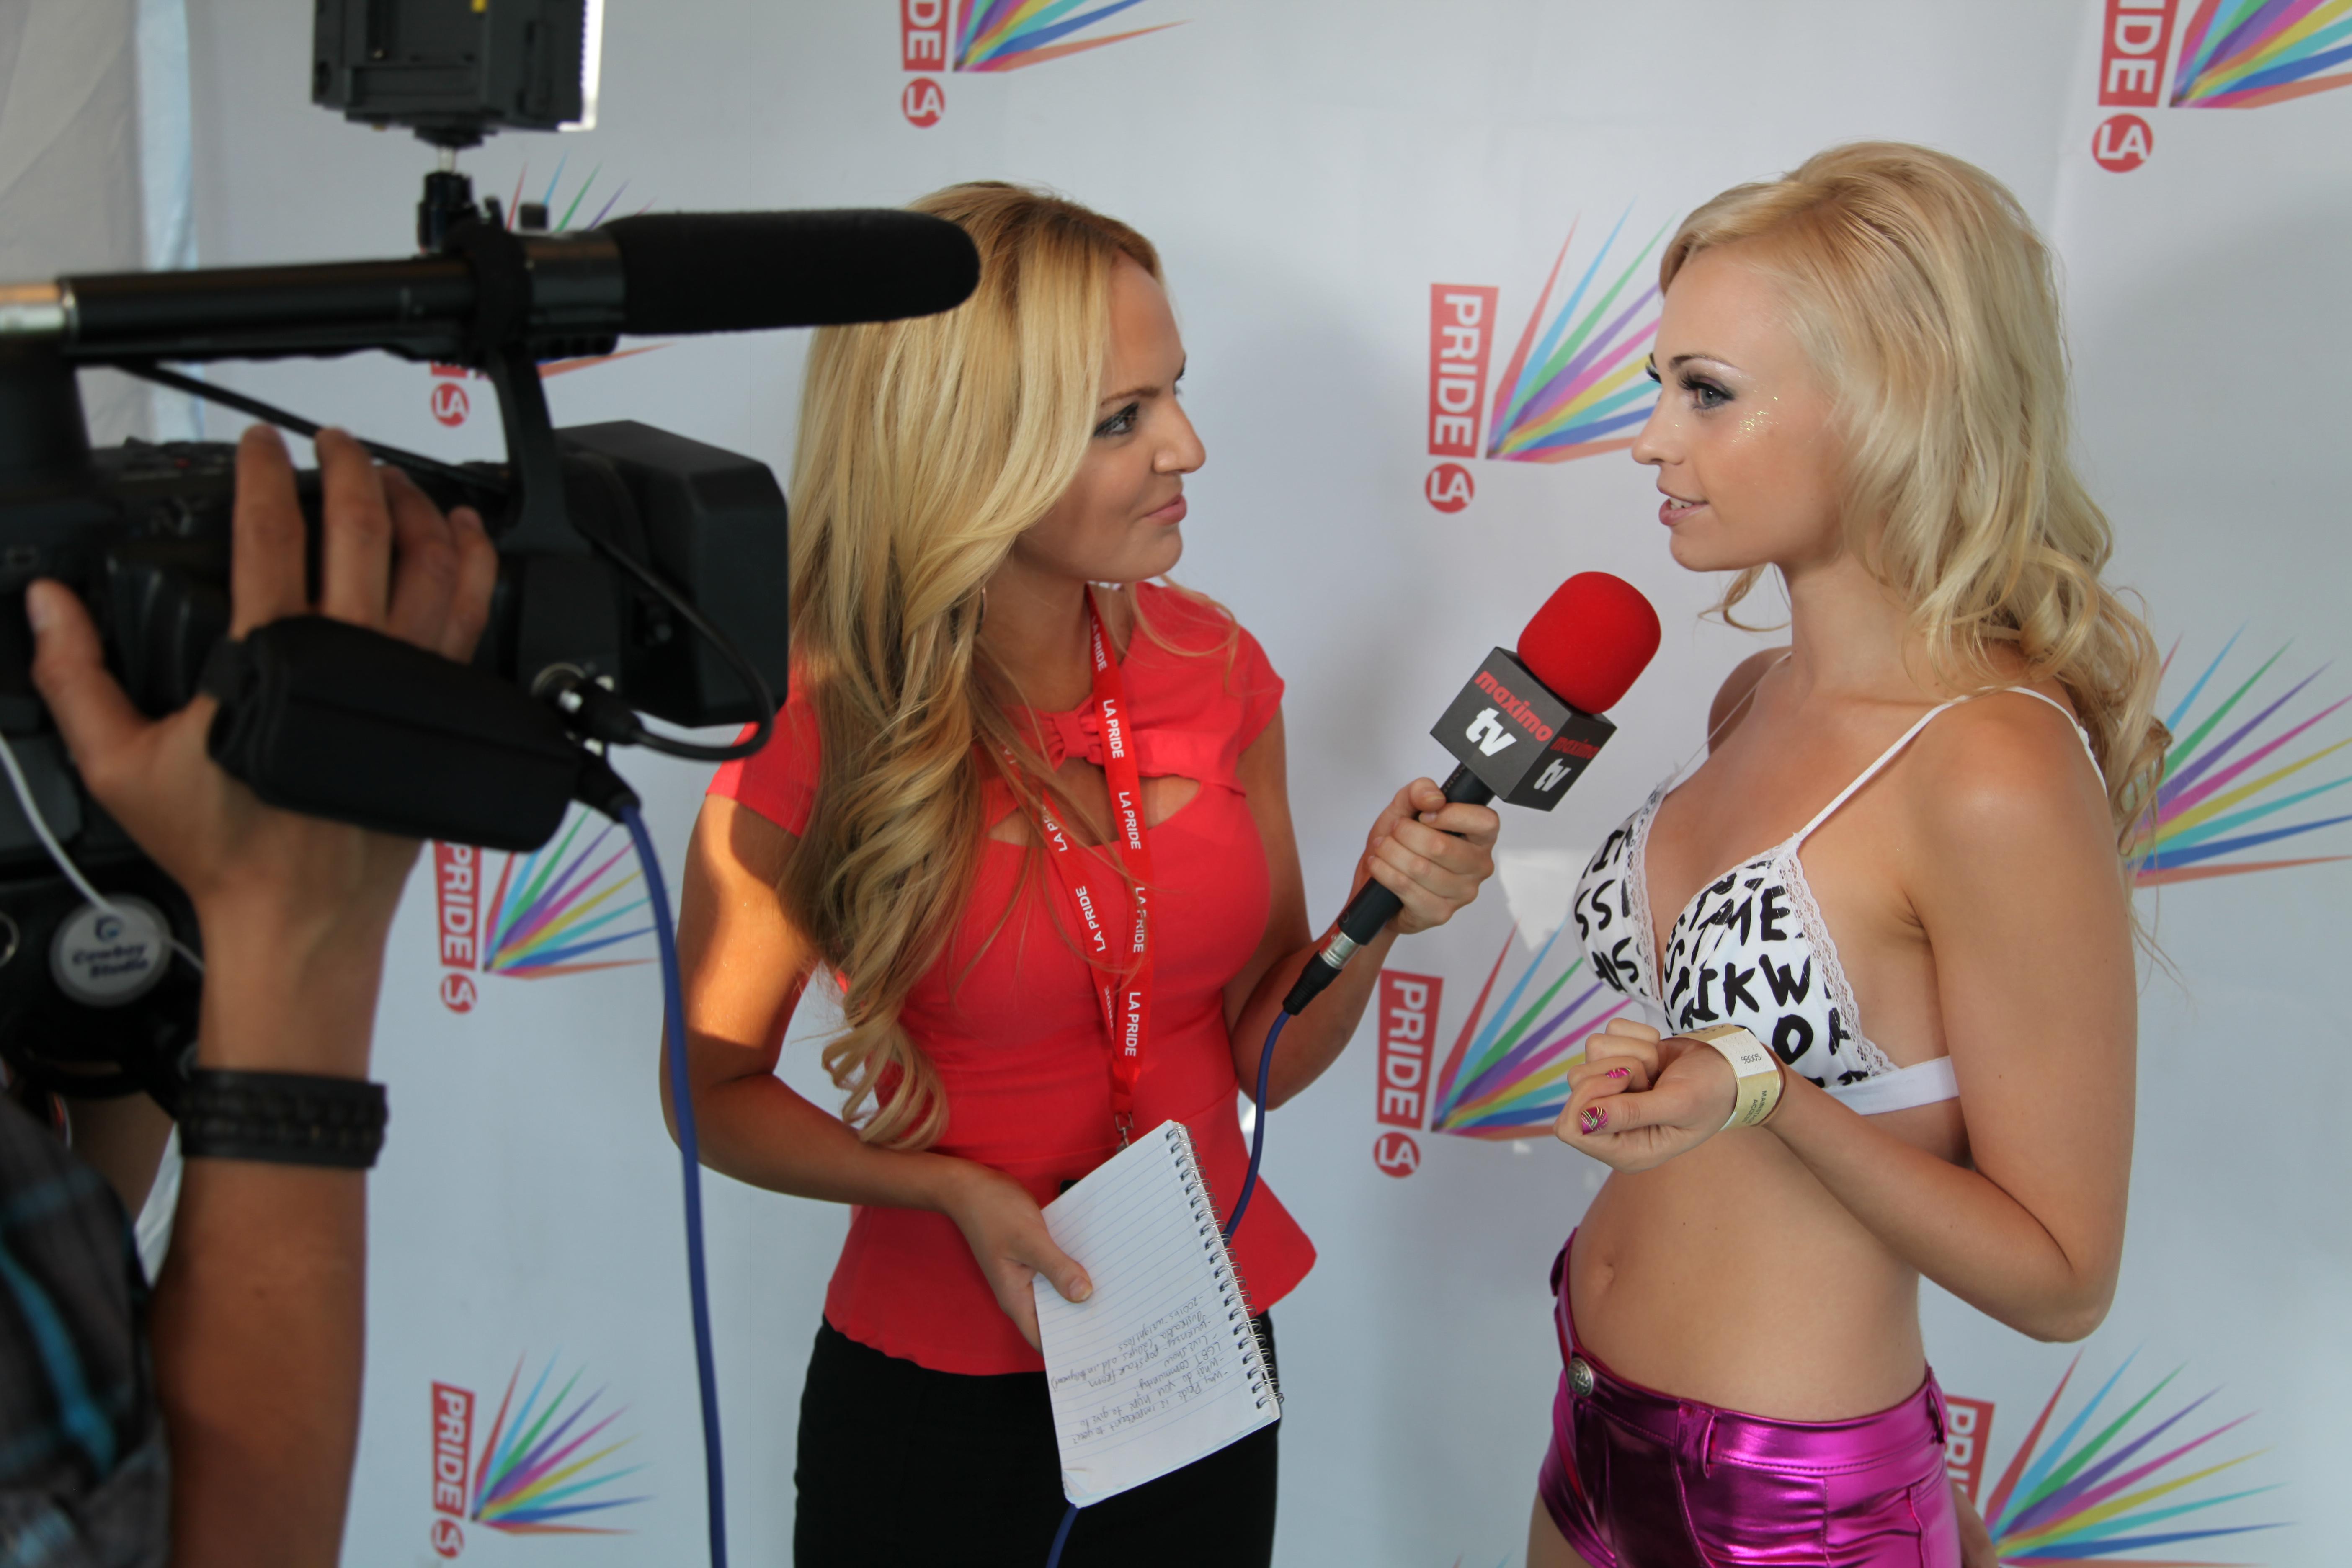 KatjaGlieson_HotMess_Interview2